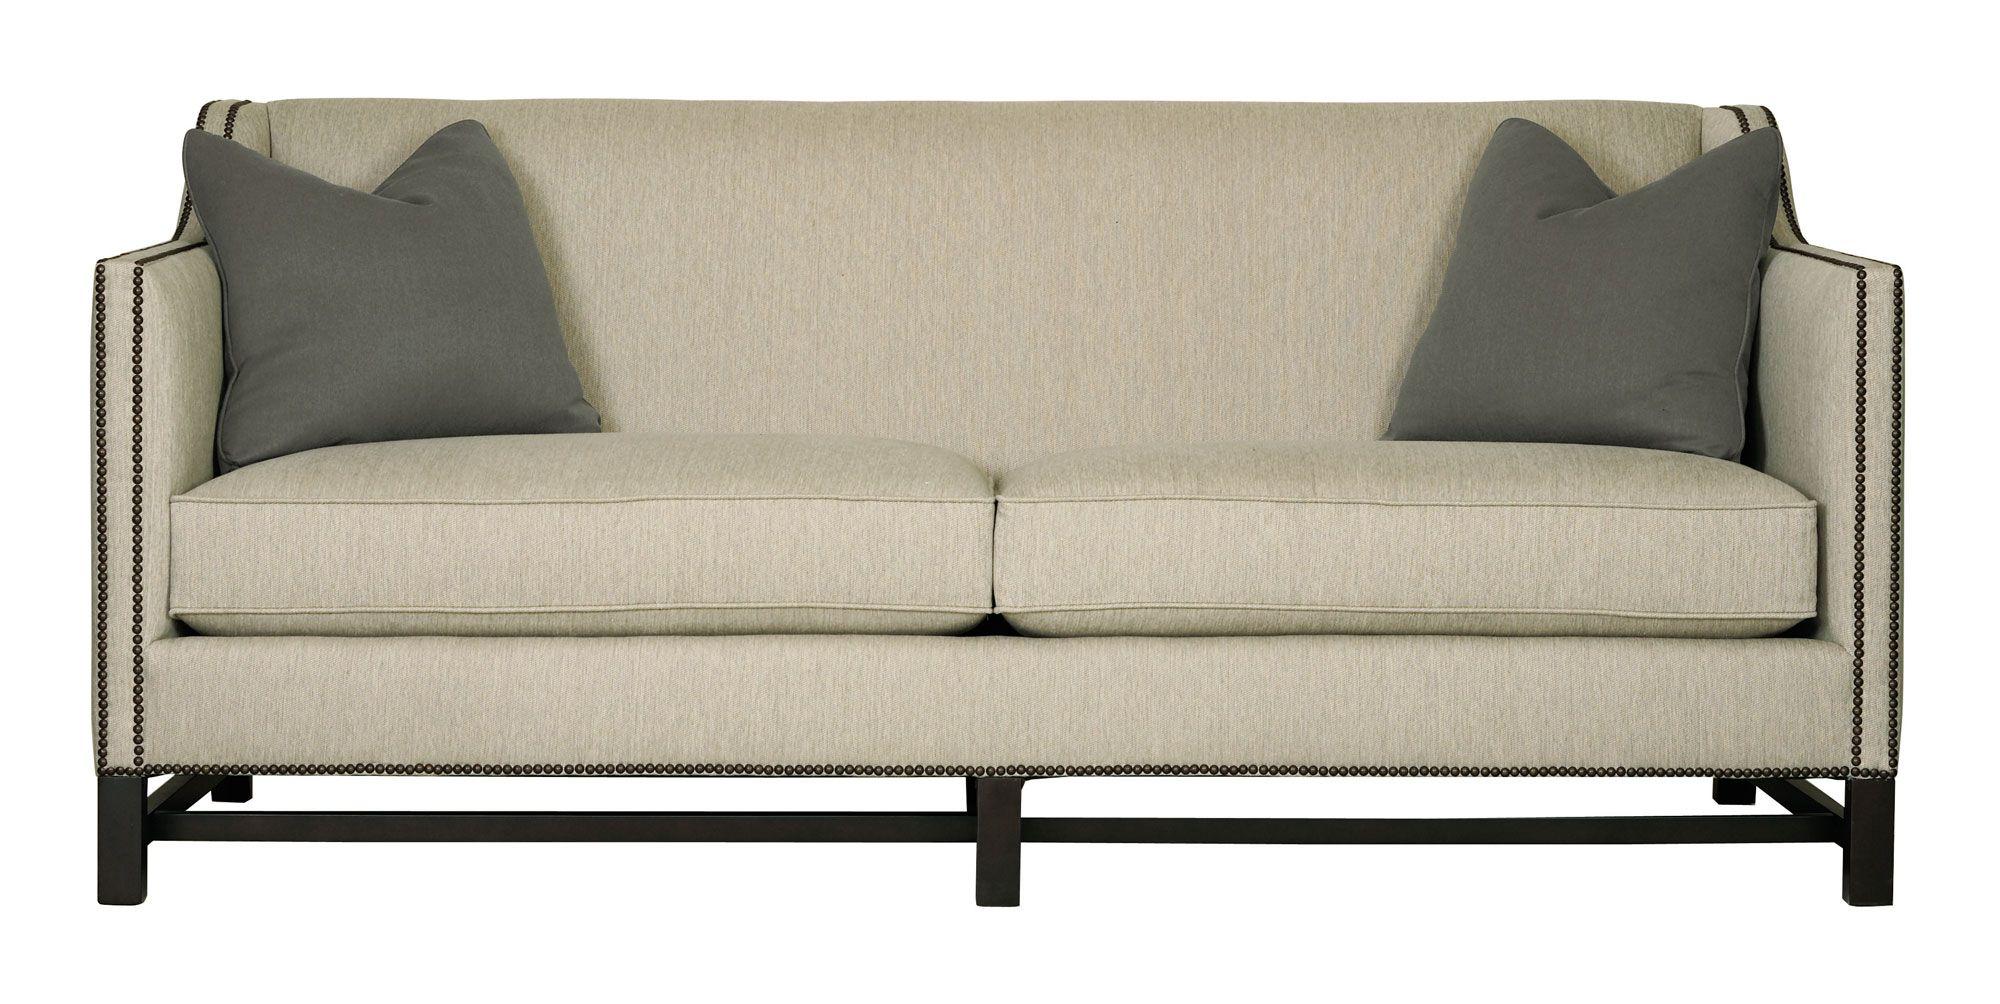 bernhardt sofas short sectional sofa pin by benhar office on furniture living room chatham officedesign interiordesign http